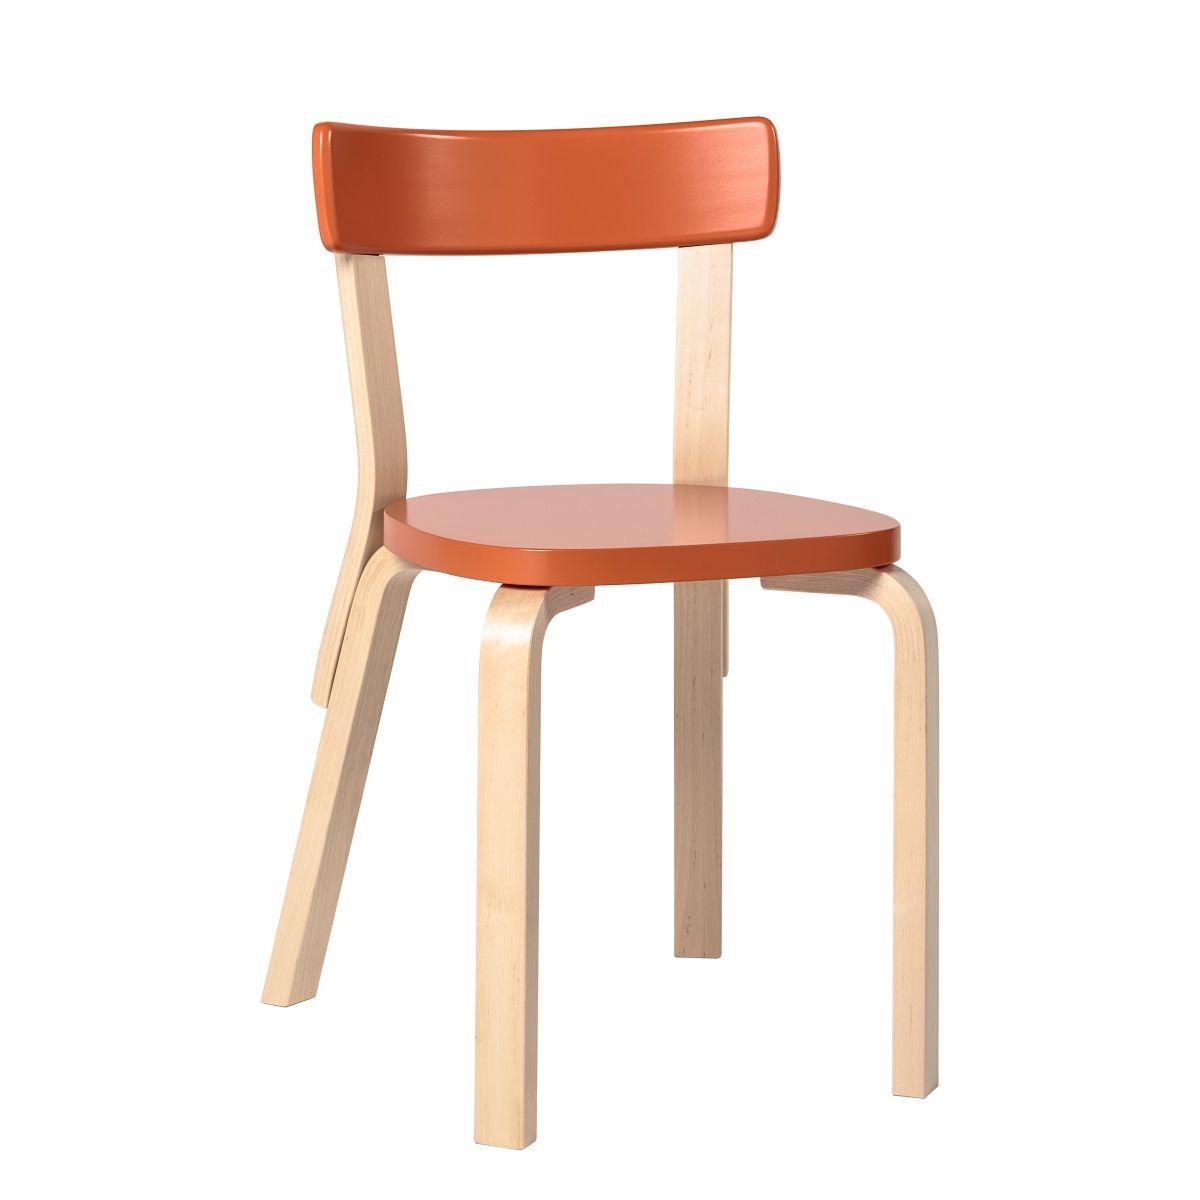 Chair 69 orange lacquer seat